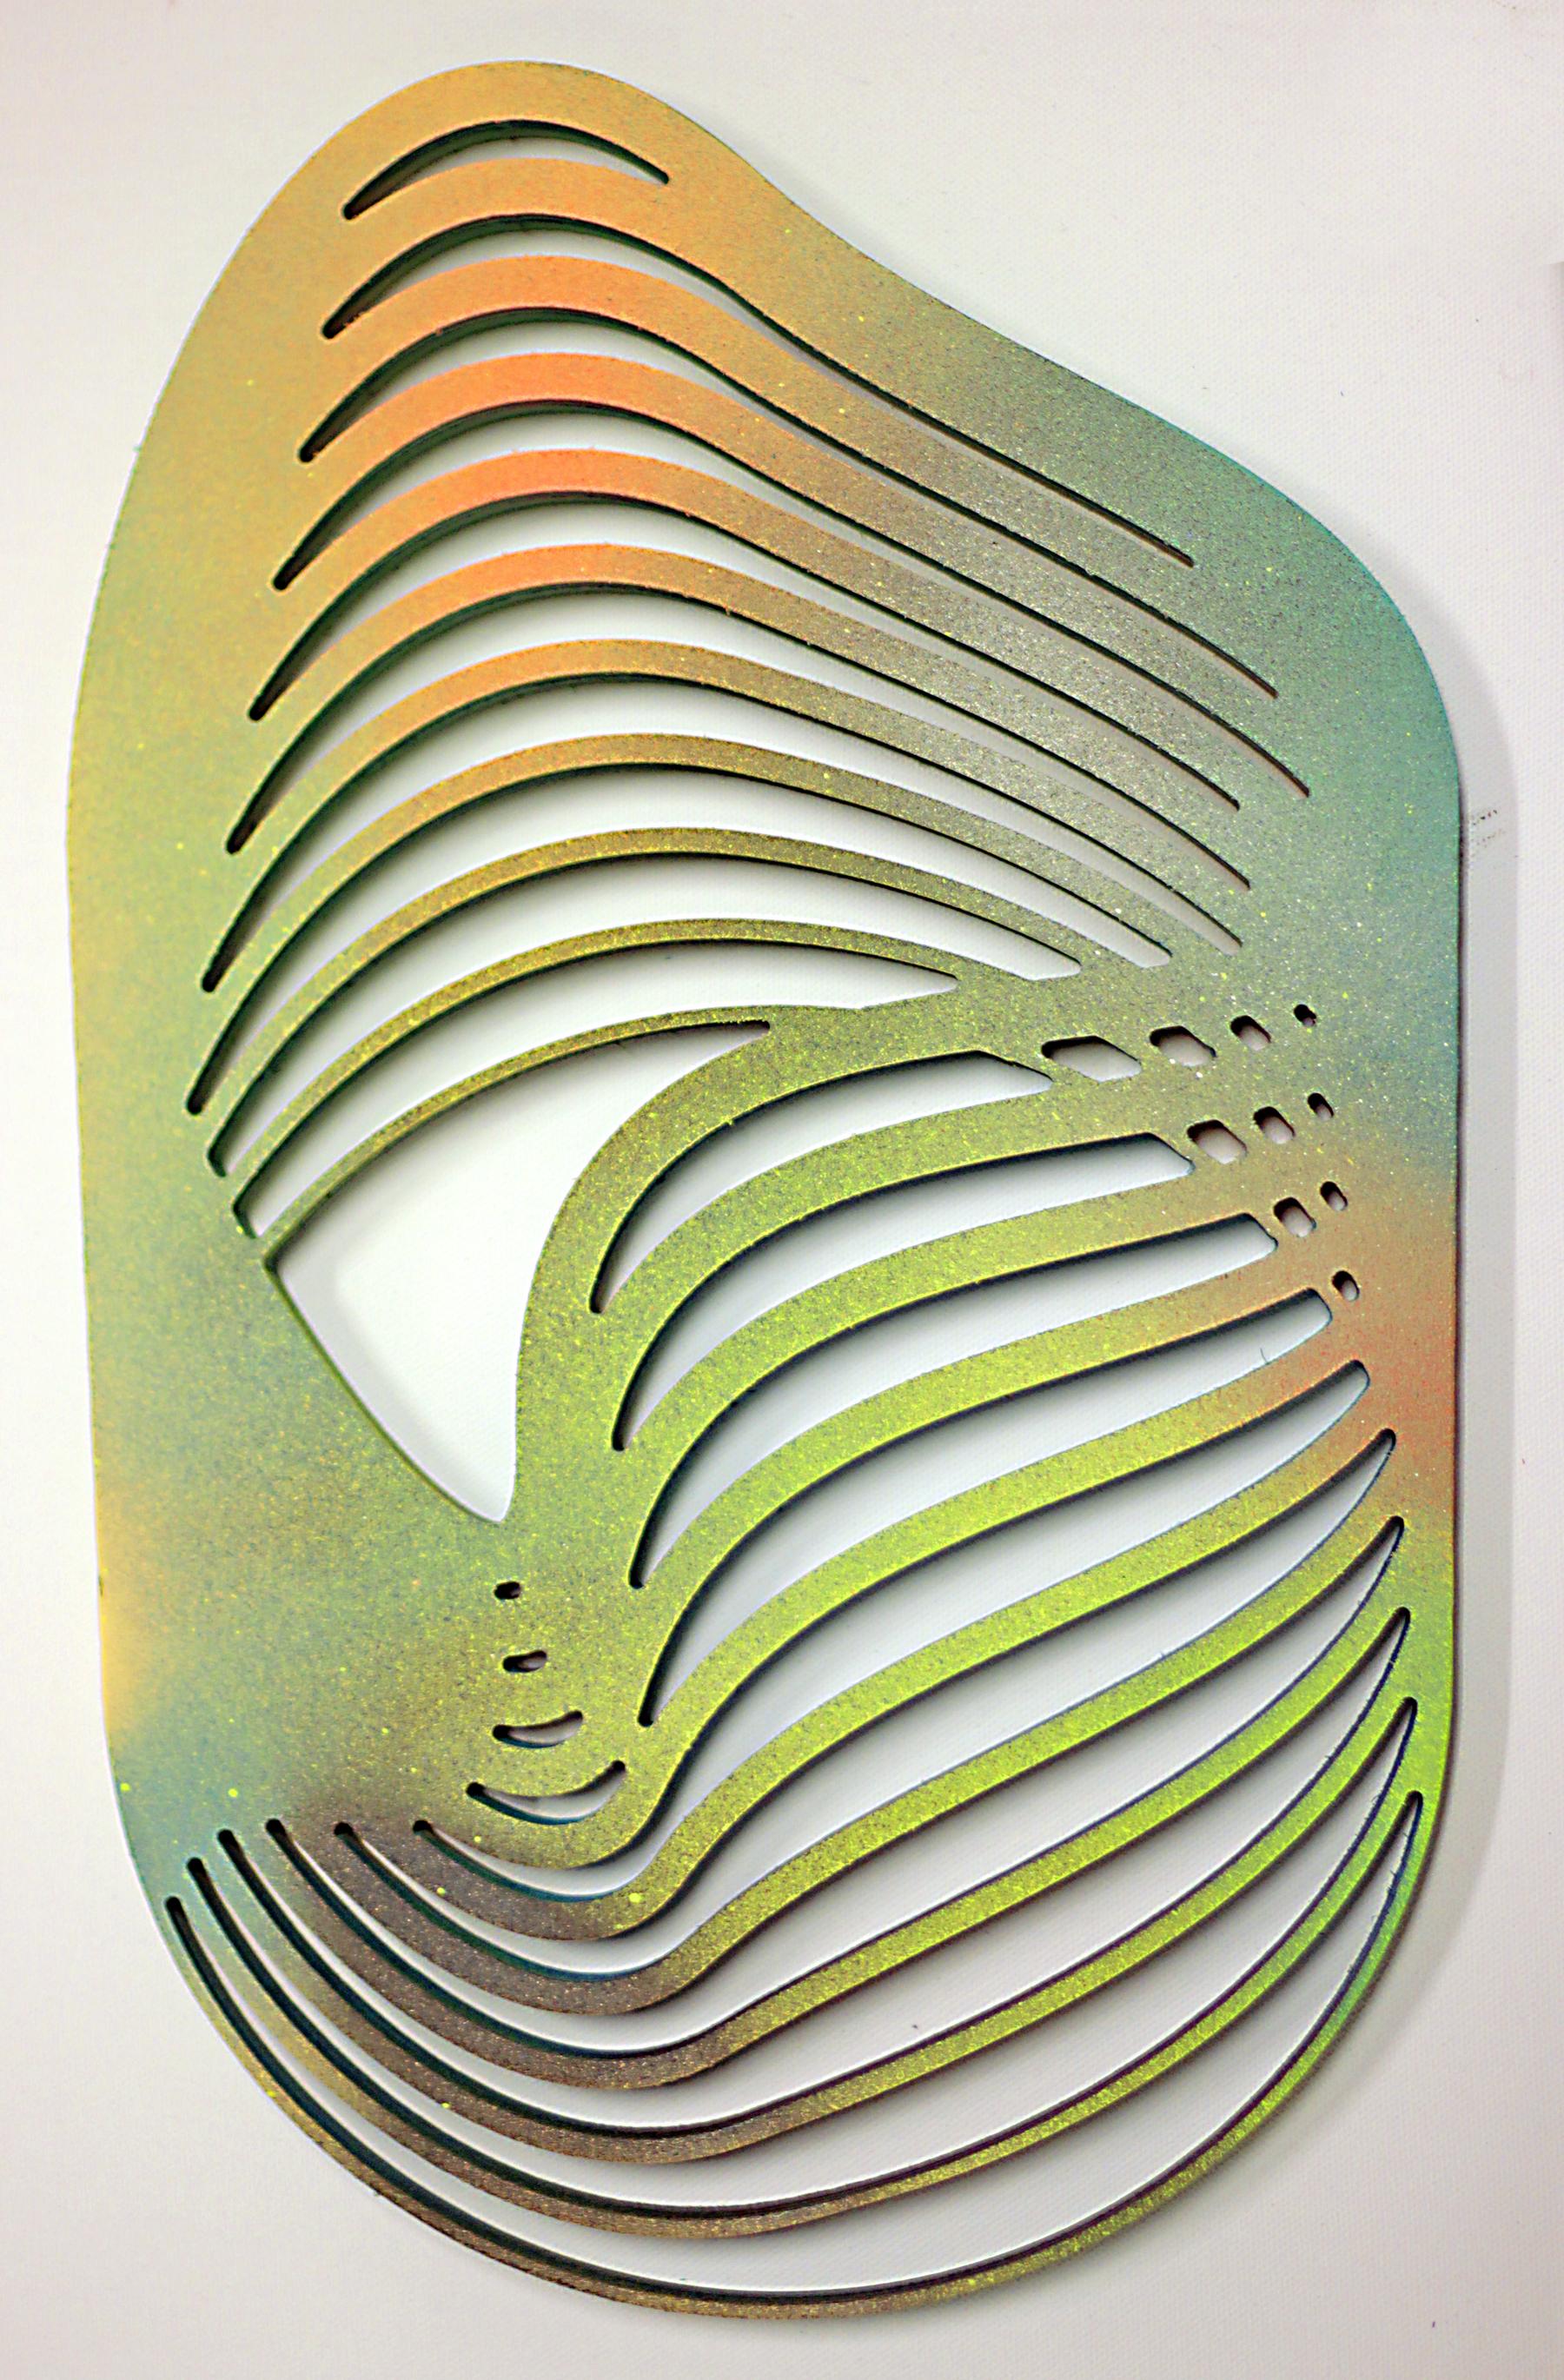 Mick_SAHARA_17x10.3_4_Wood_Spray paint_Original_2018_550.jpg